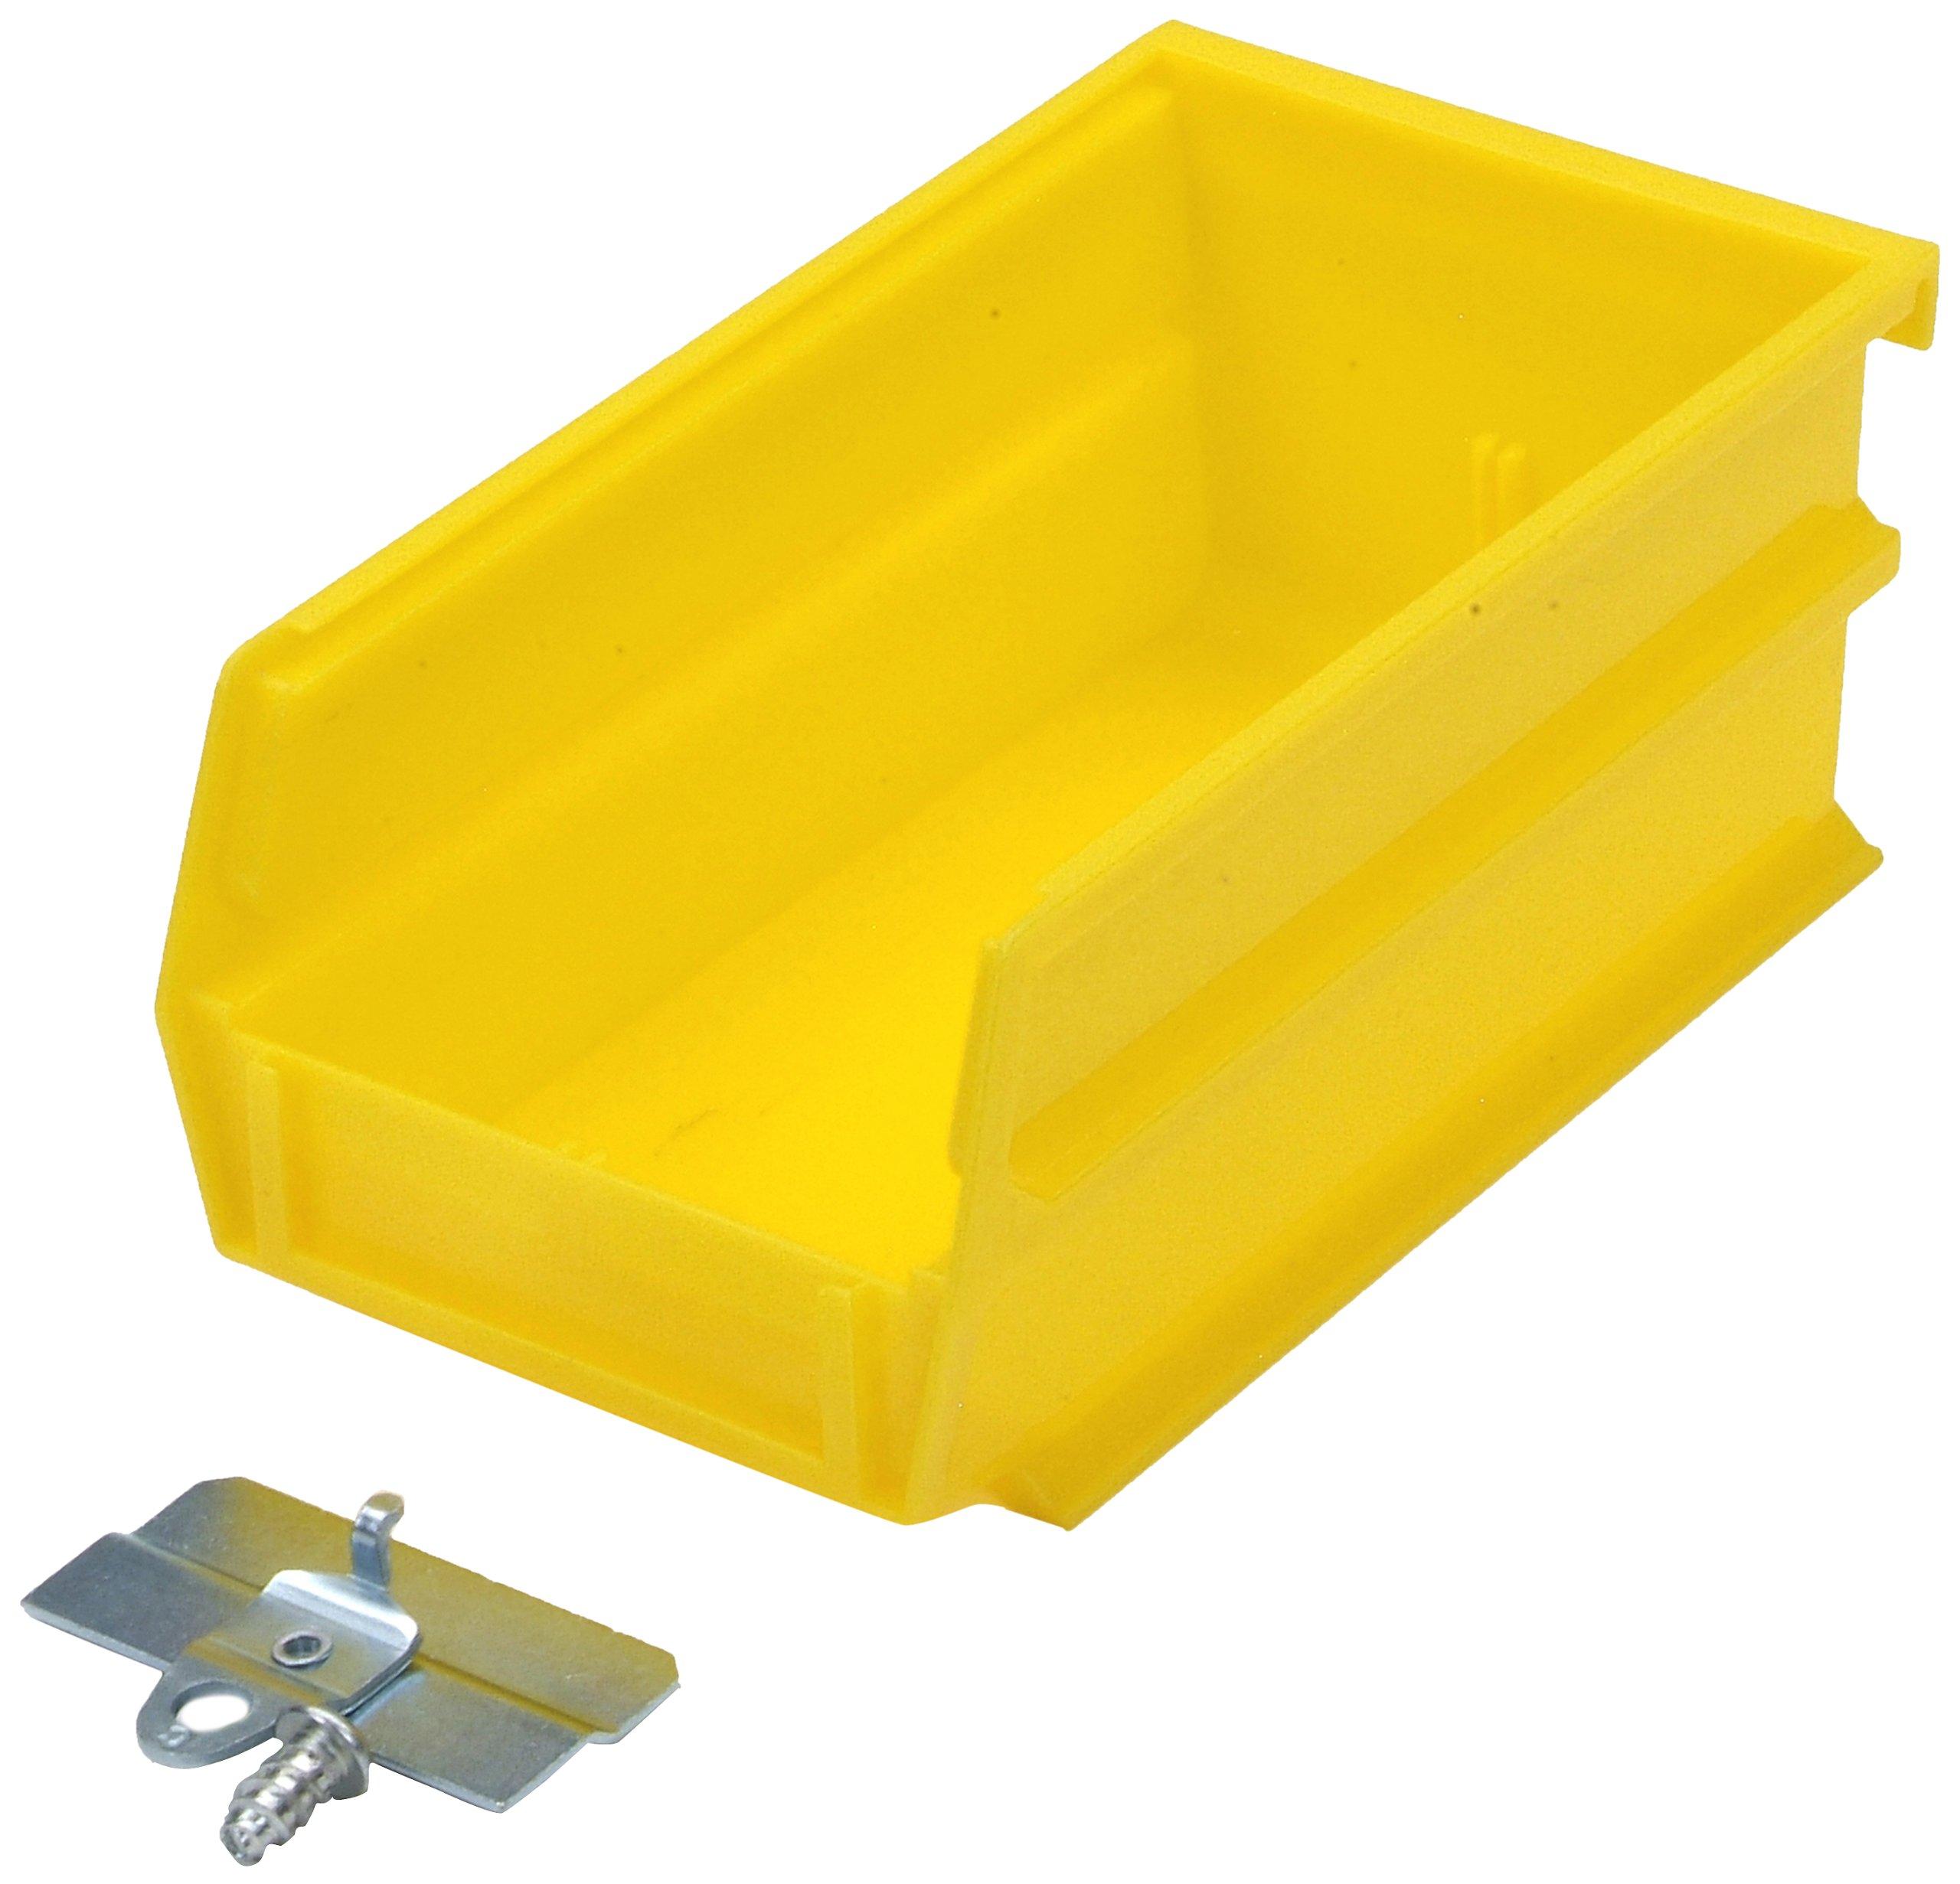 BinKit Triton Products BK-220 LocBin Hanging Bin BinClip Kits 7-3/8-Inch L 4-1/8-Inch W 3-Inch H Yellow Polypropylene 24 Count